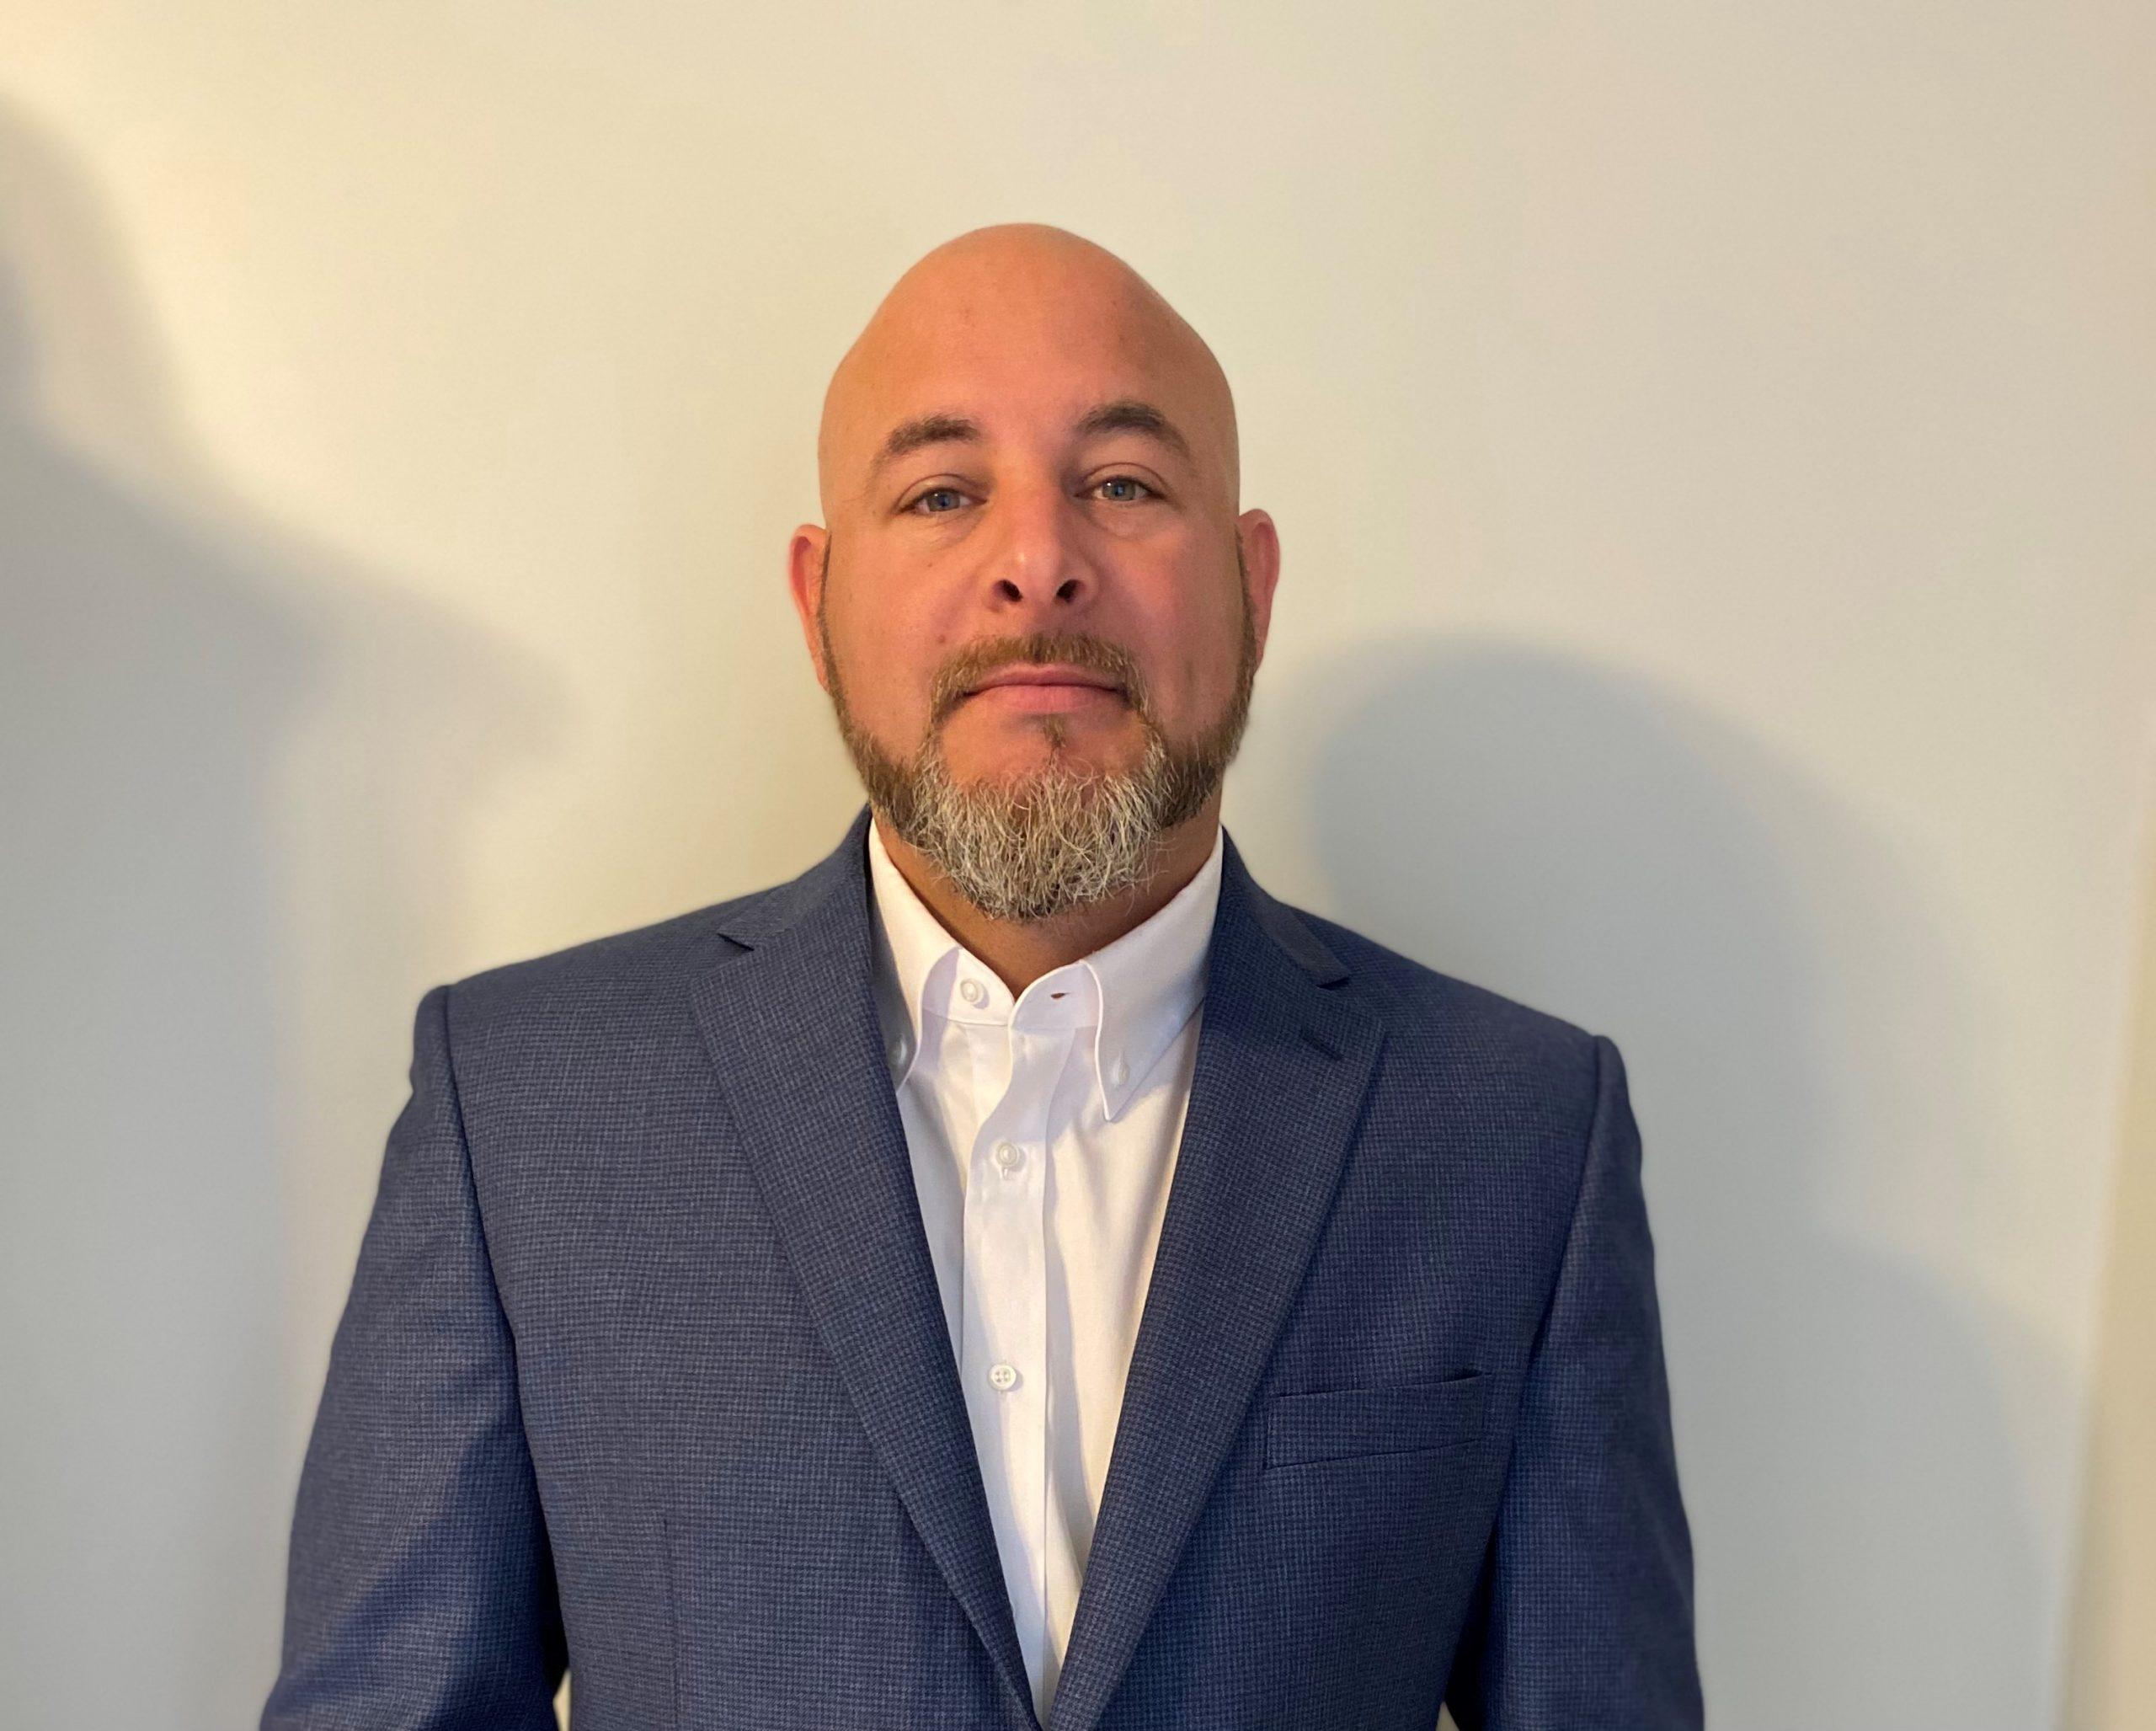 Luis Ochoa, Eastern Regional Sales Manager for NAVAC